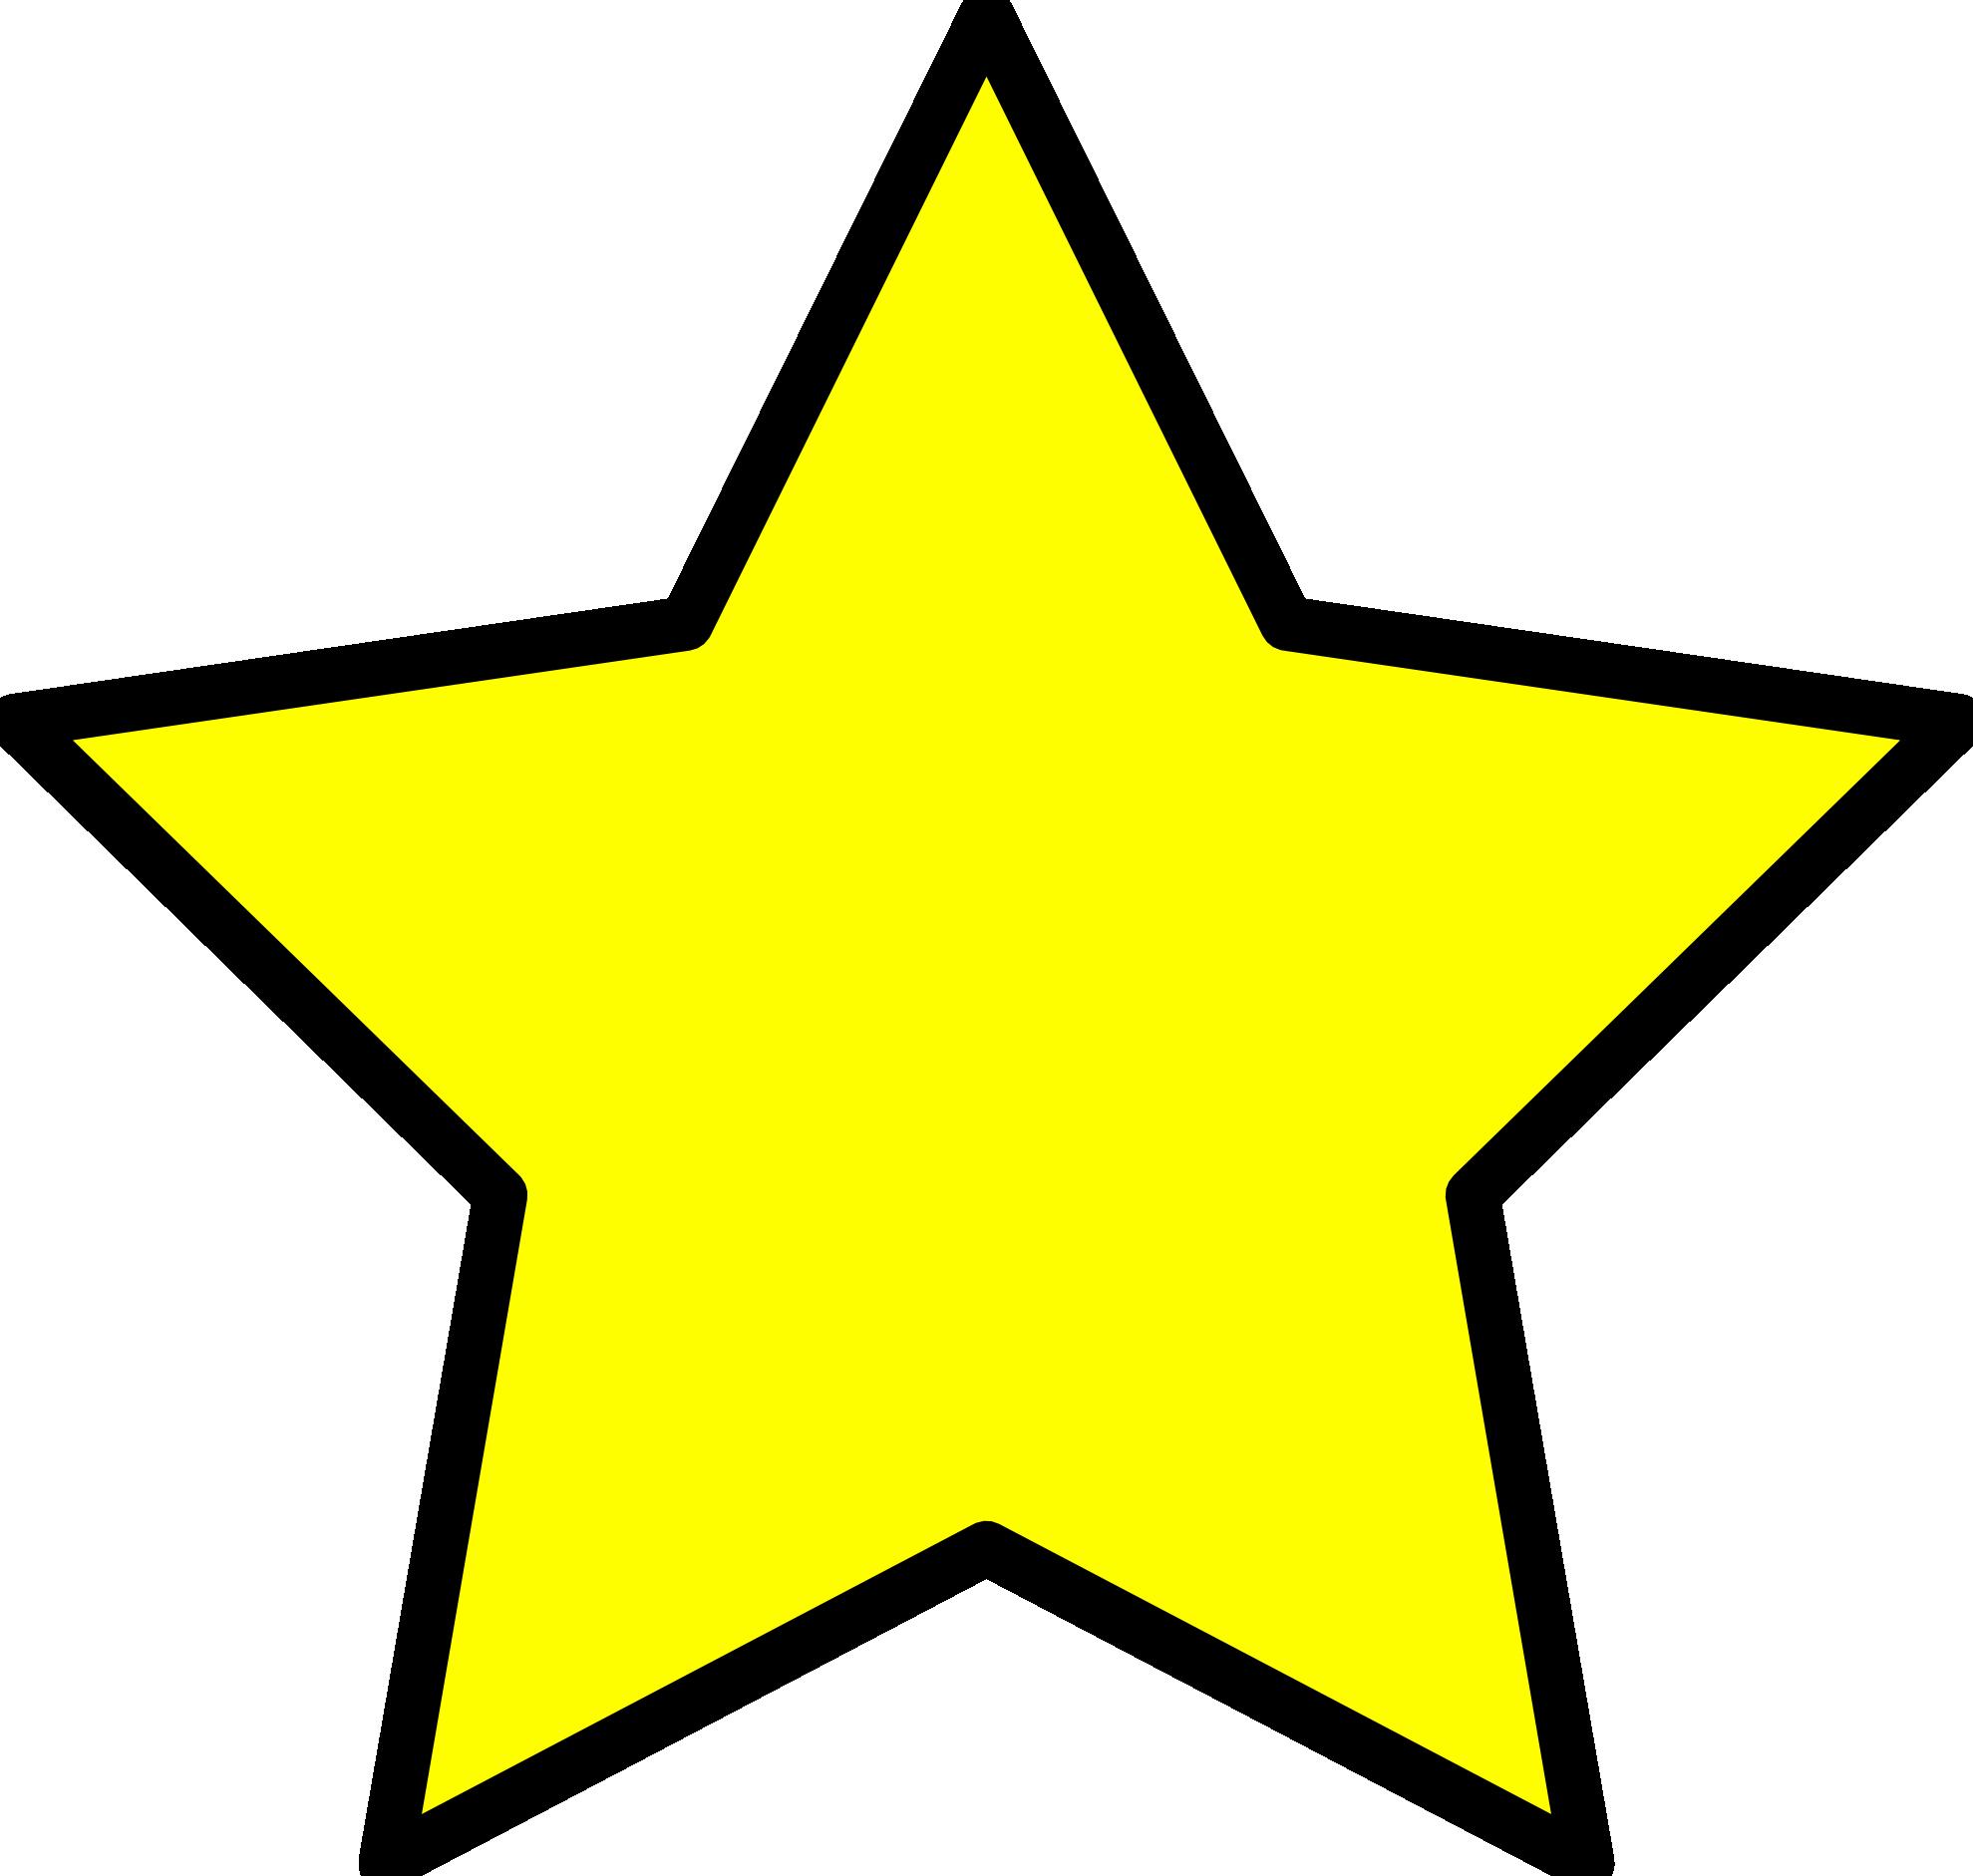 Falling Stars clipart yellow star Star Clipart Clipart Bus Star